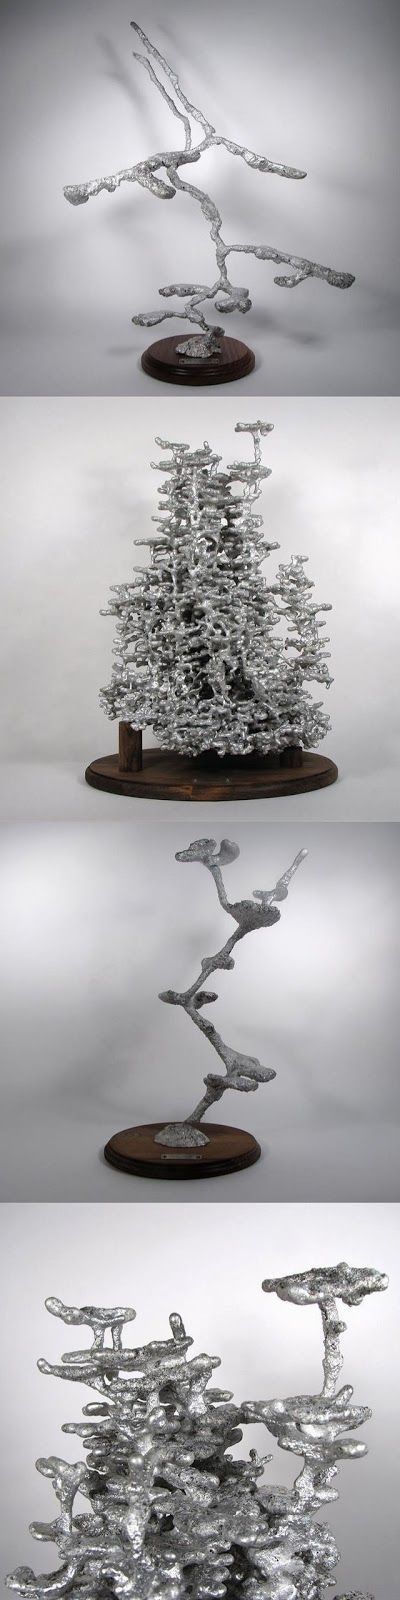 Aluminium Ant Colony Casts - Educational and beautiful!